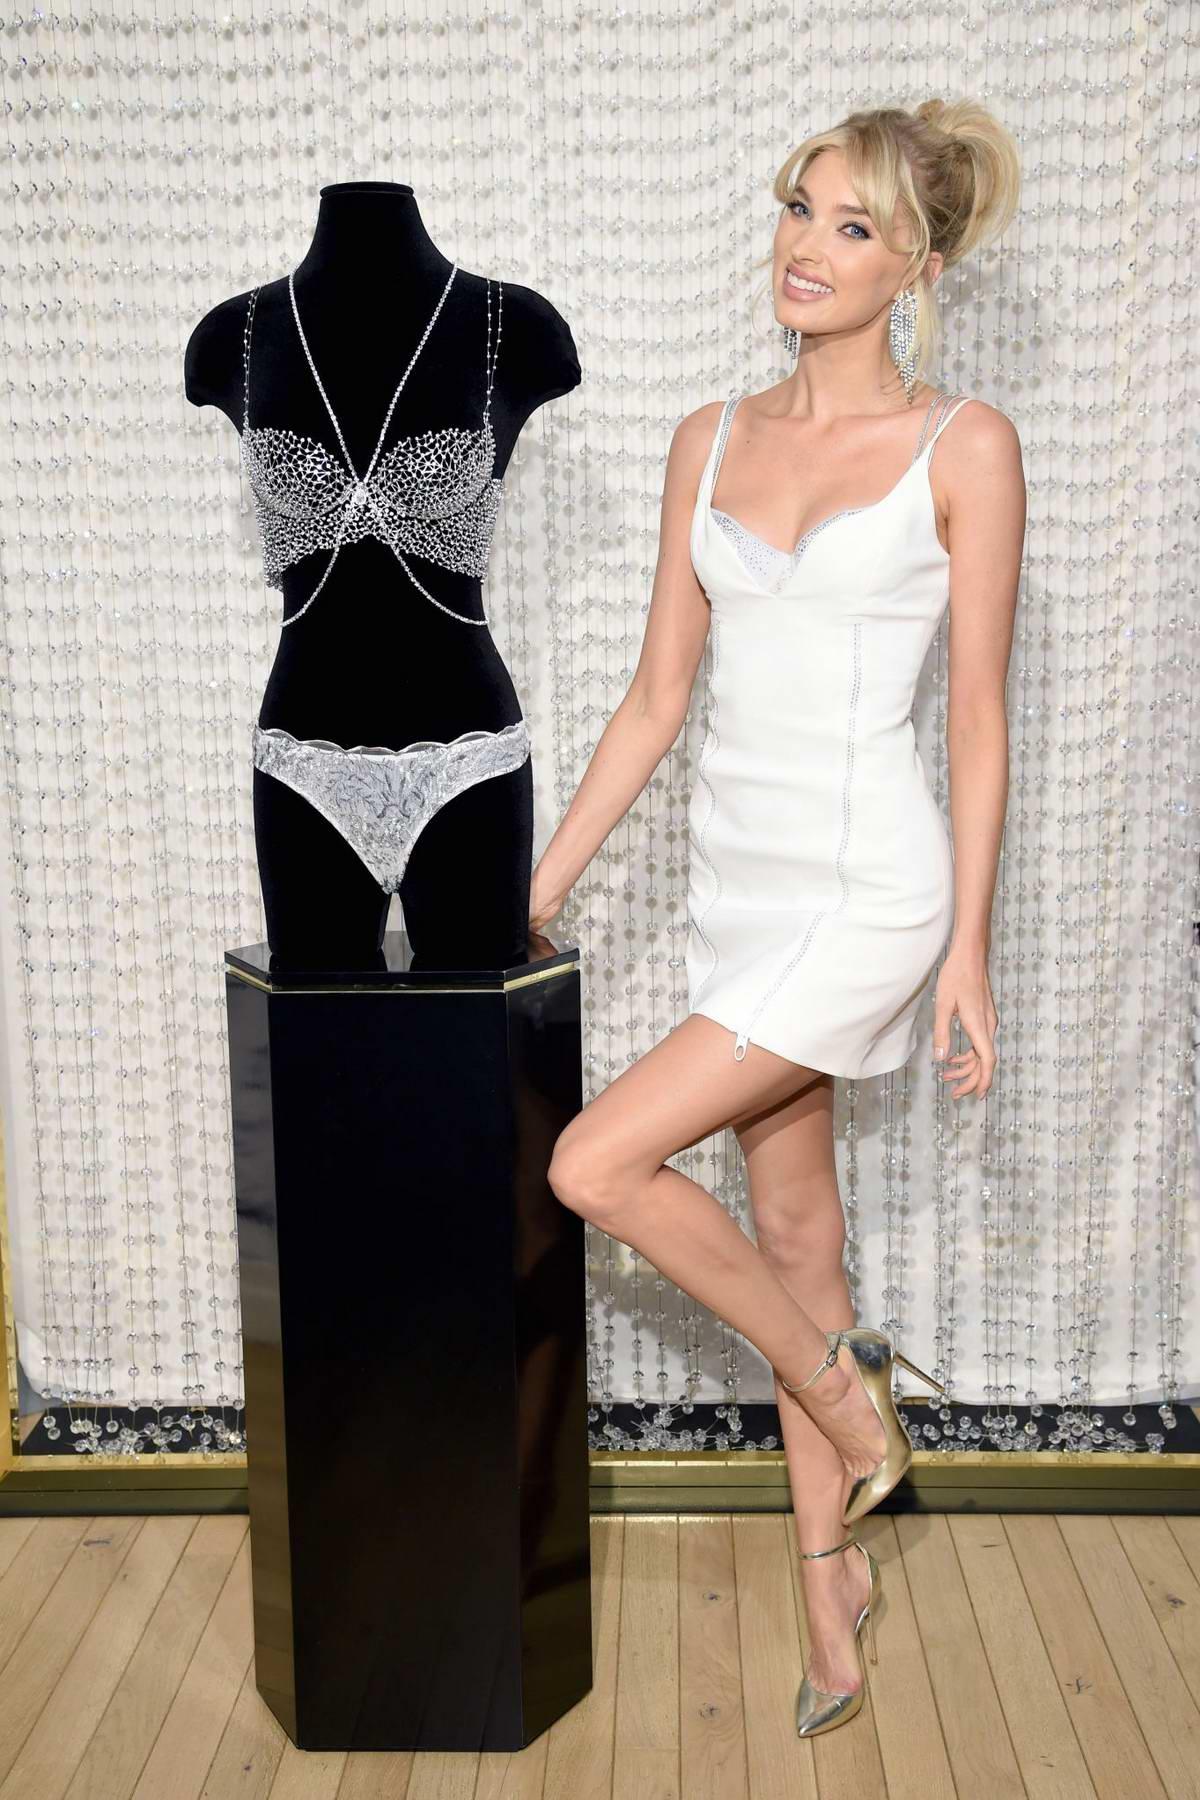 Elsa Hosk unveils the 2018 Dream Angels Fantasy Bra ahead of the Victoria's Secret Fashion Show in New York City